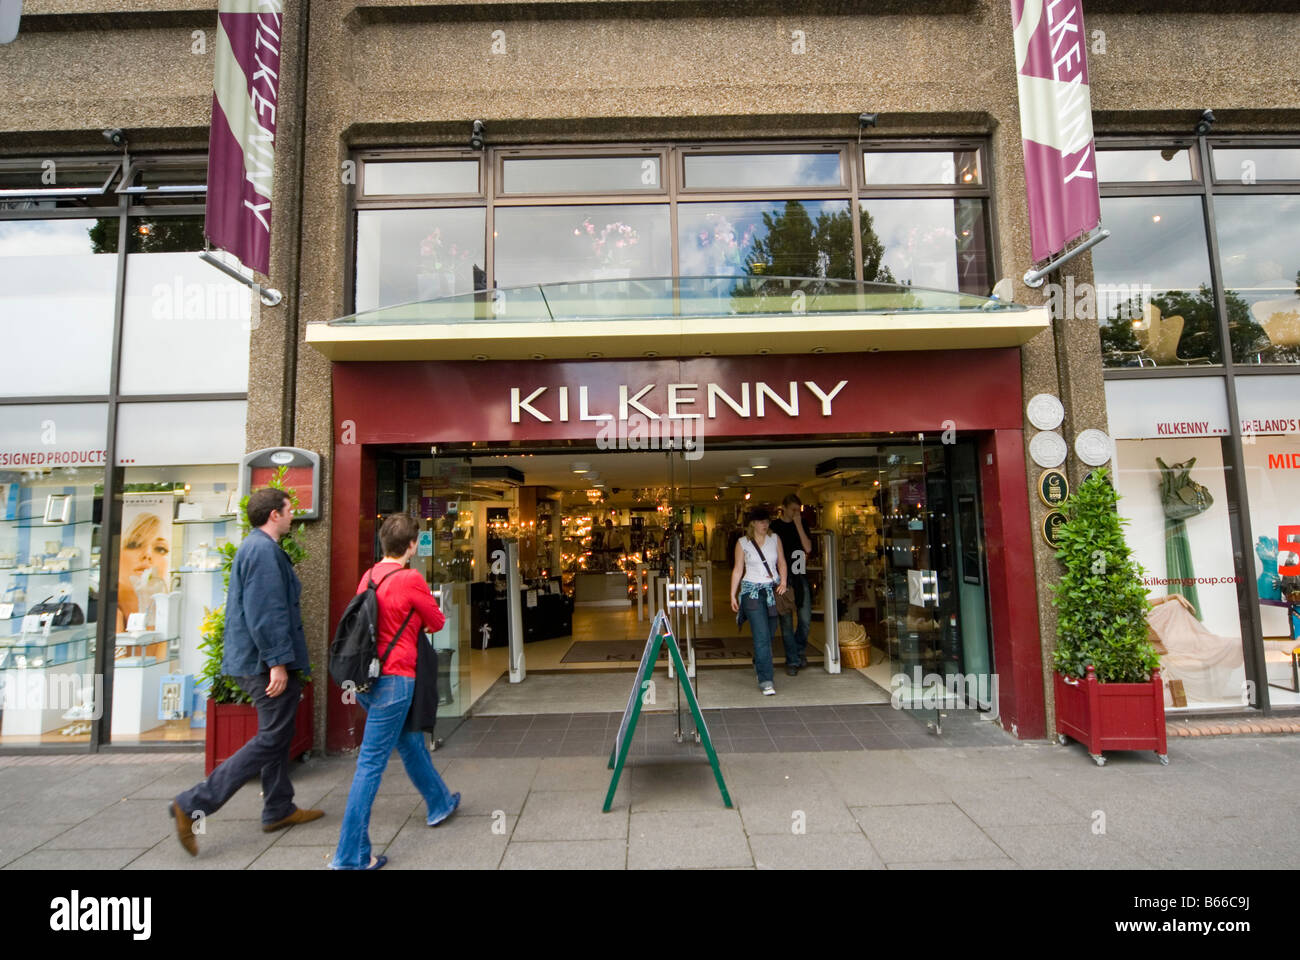 Kilkenny Shop - Stock Image